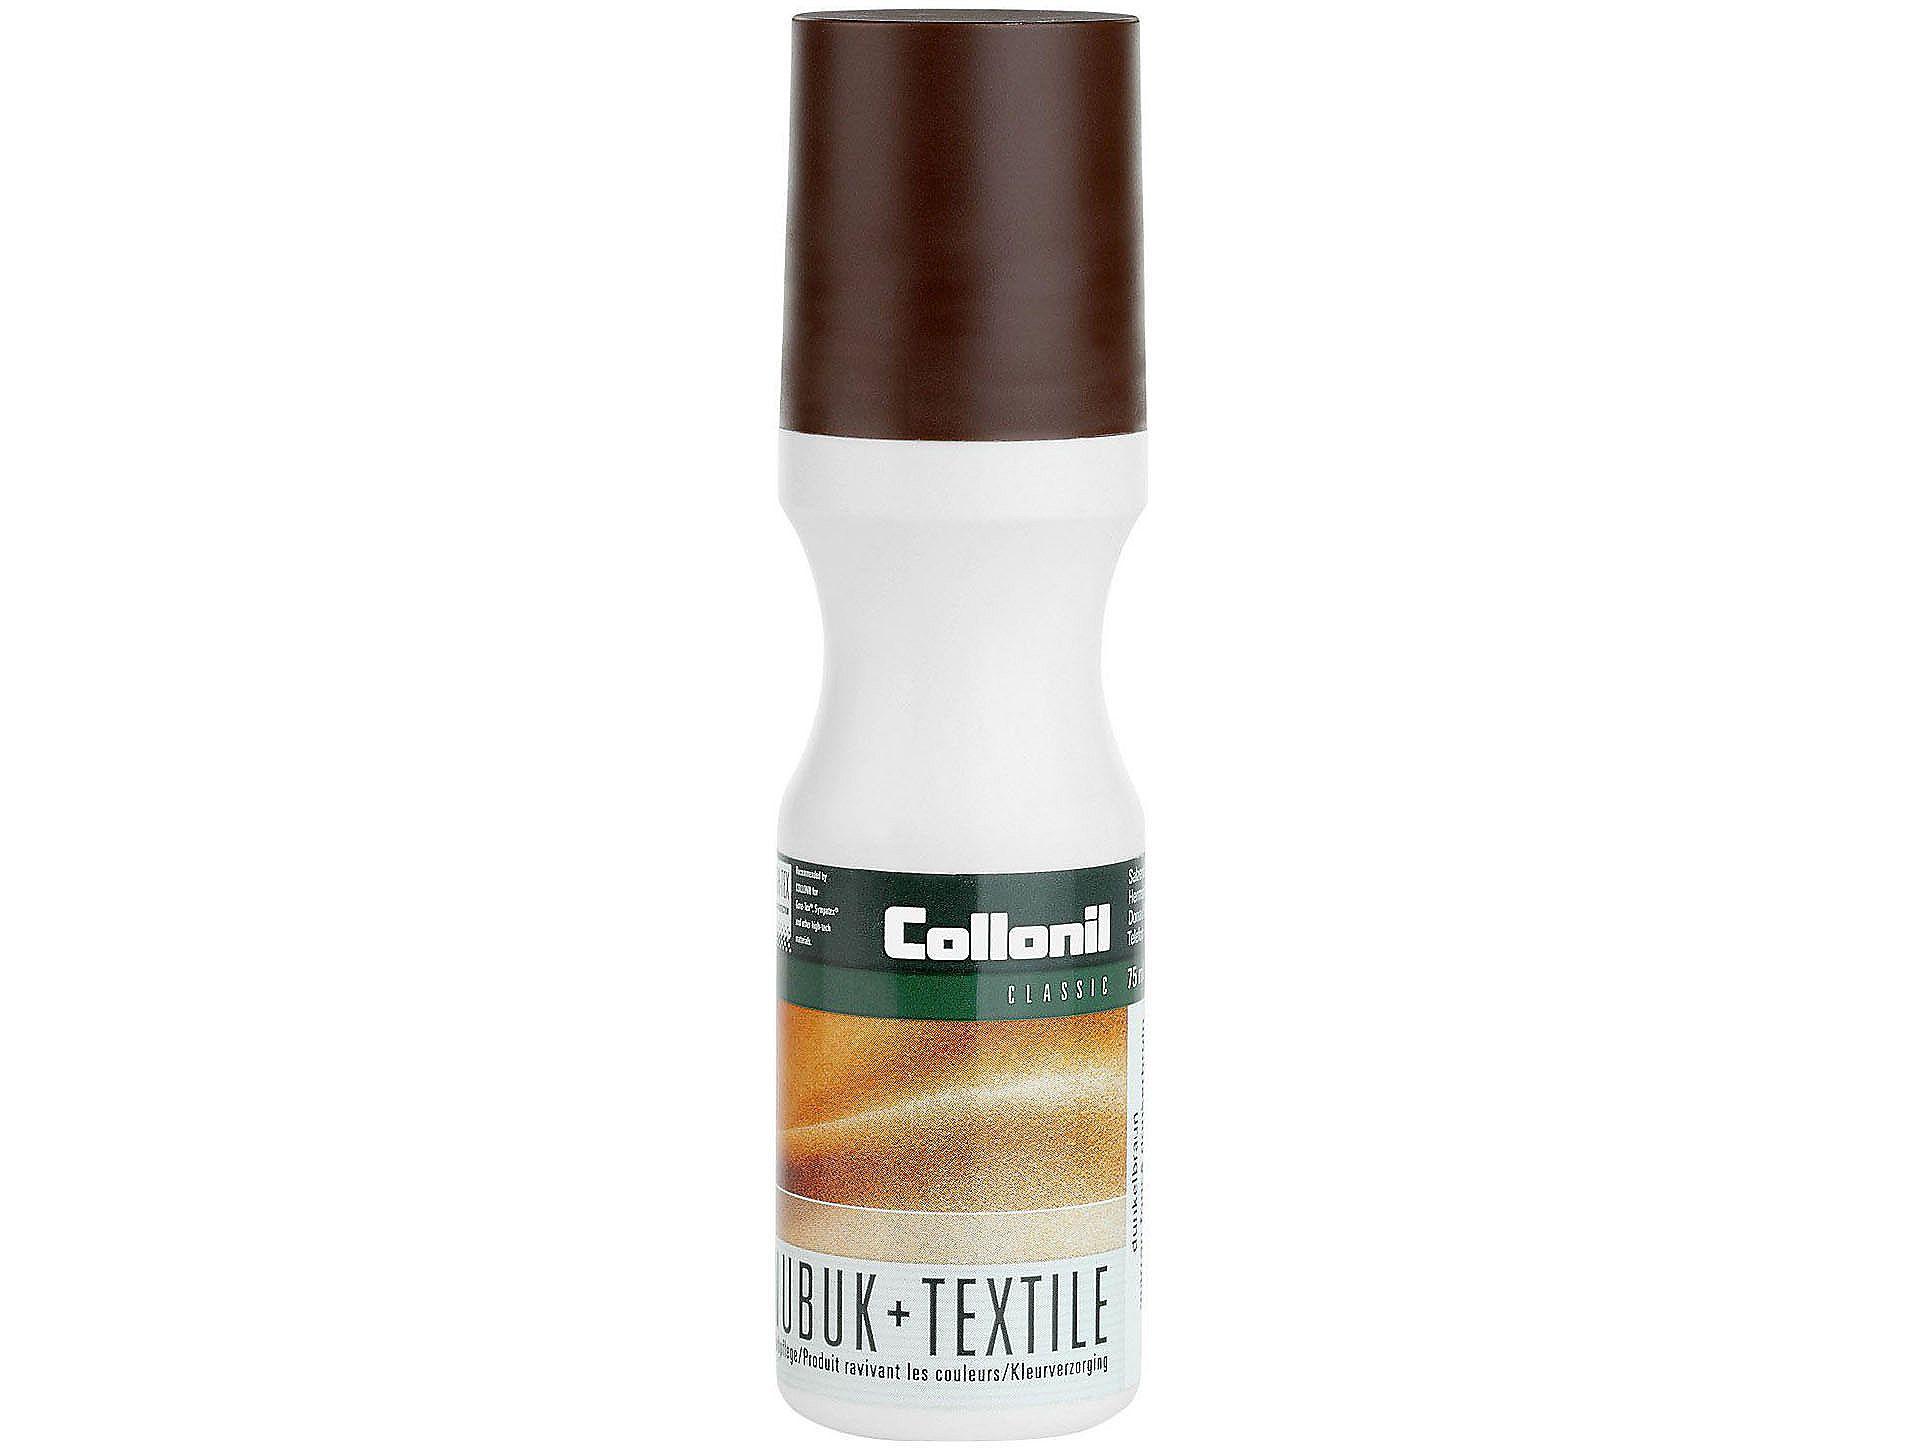 Collonil Nubuk + Textile Classic     75 ml dunkelbraun